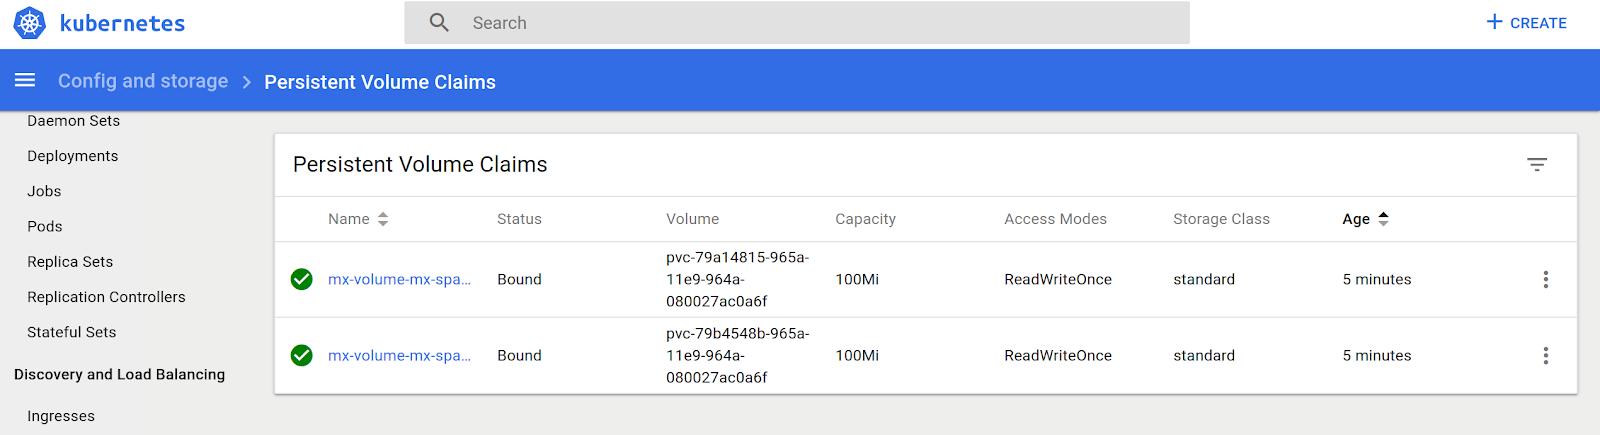 Data Grid ConfiguredS with PersistenceVolumeClaim (PVC)